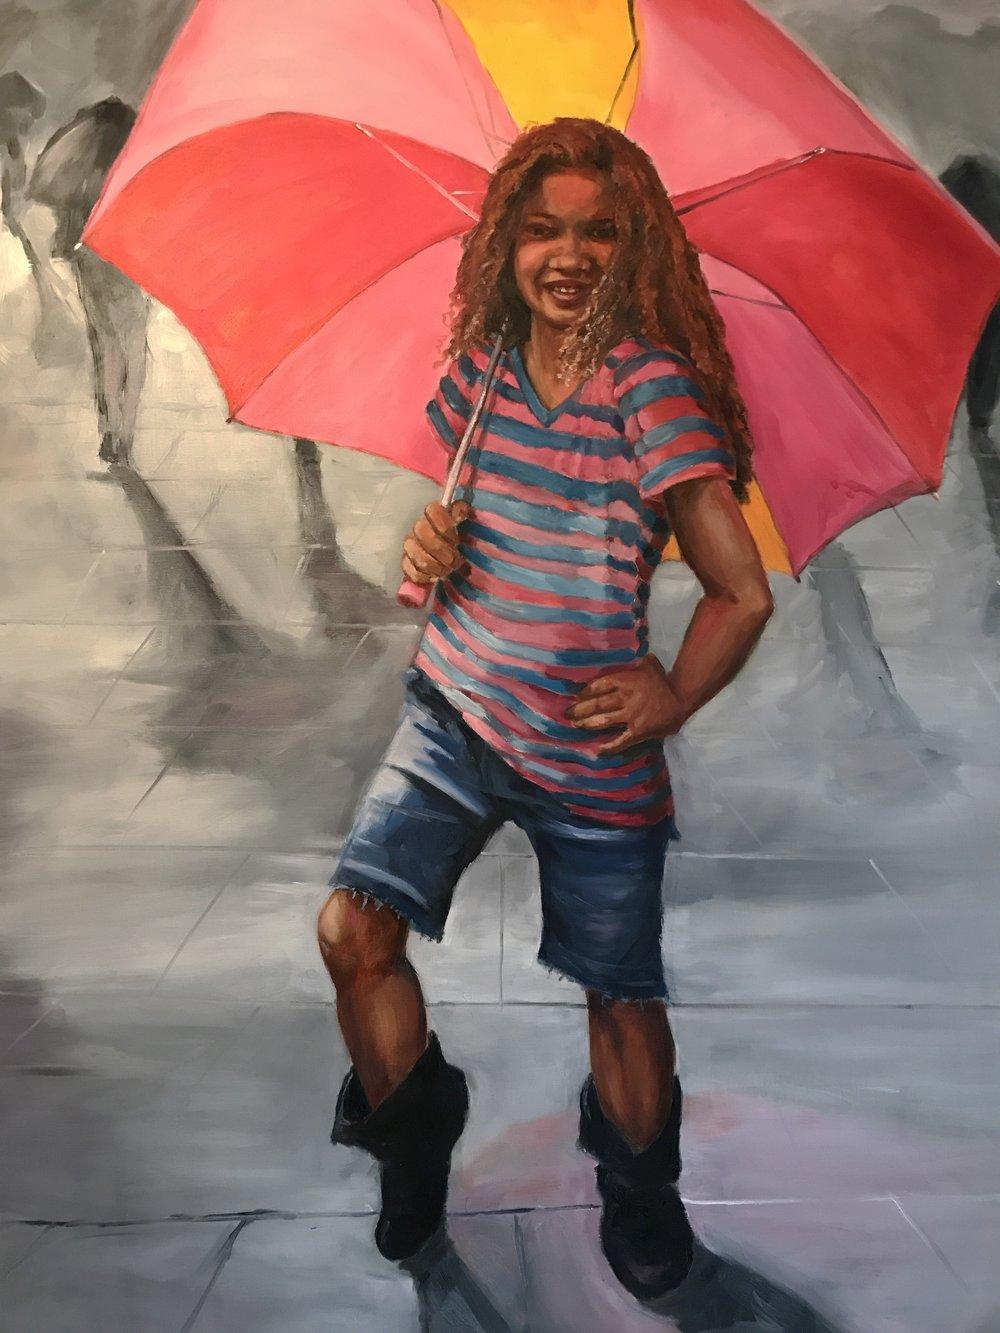 Posing in the Rain